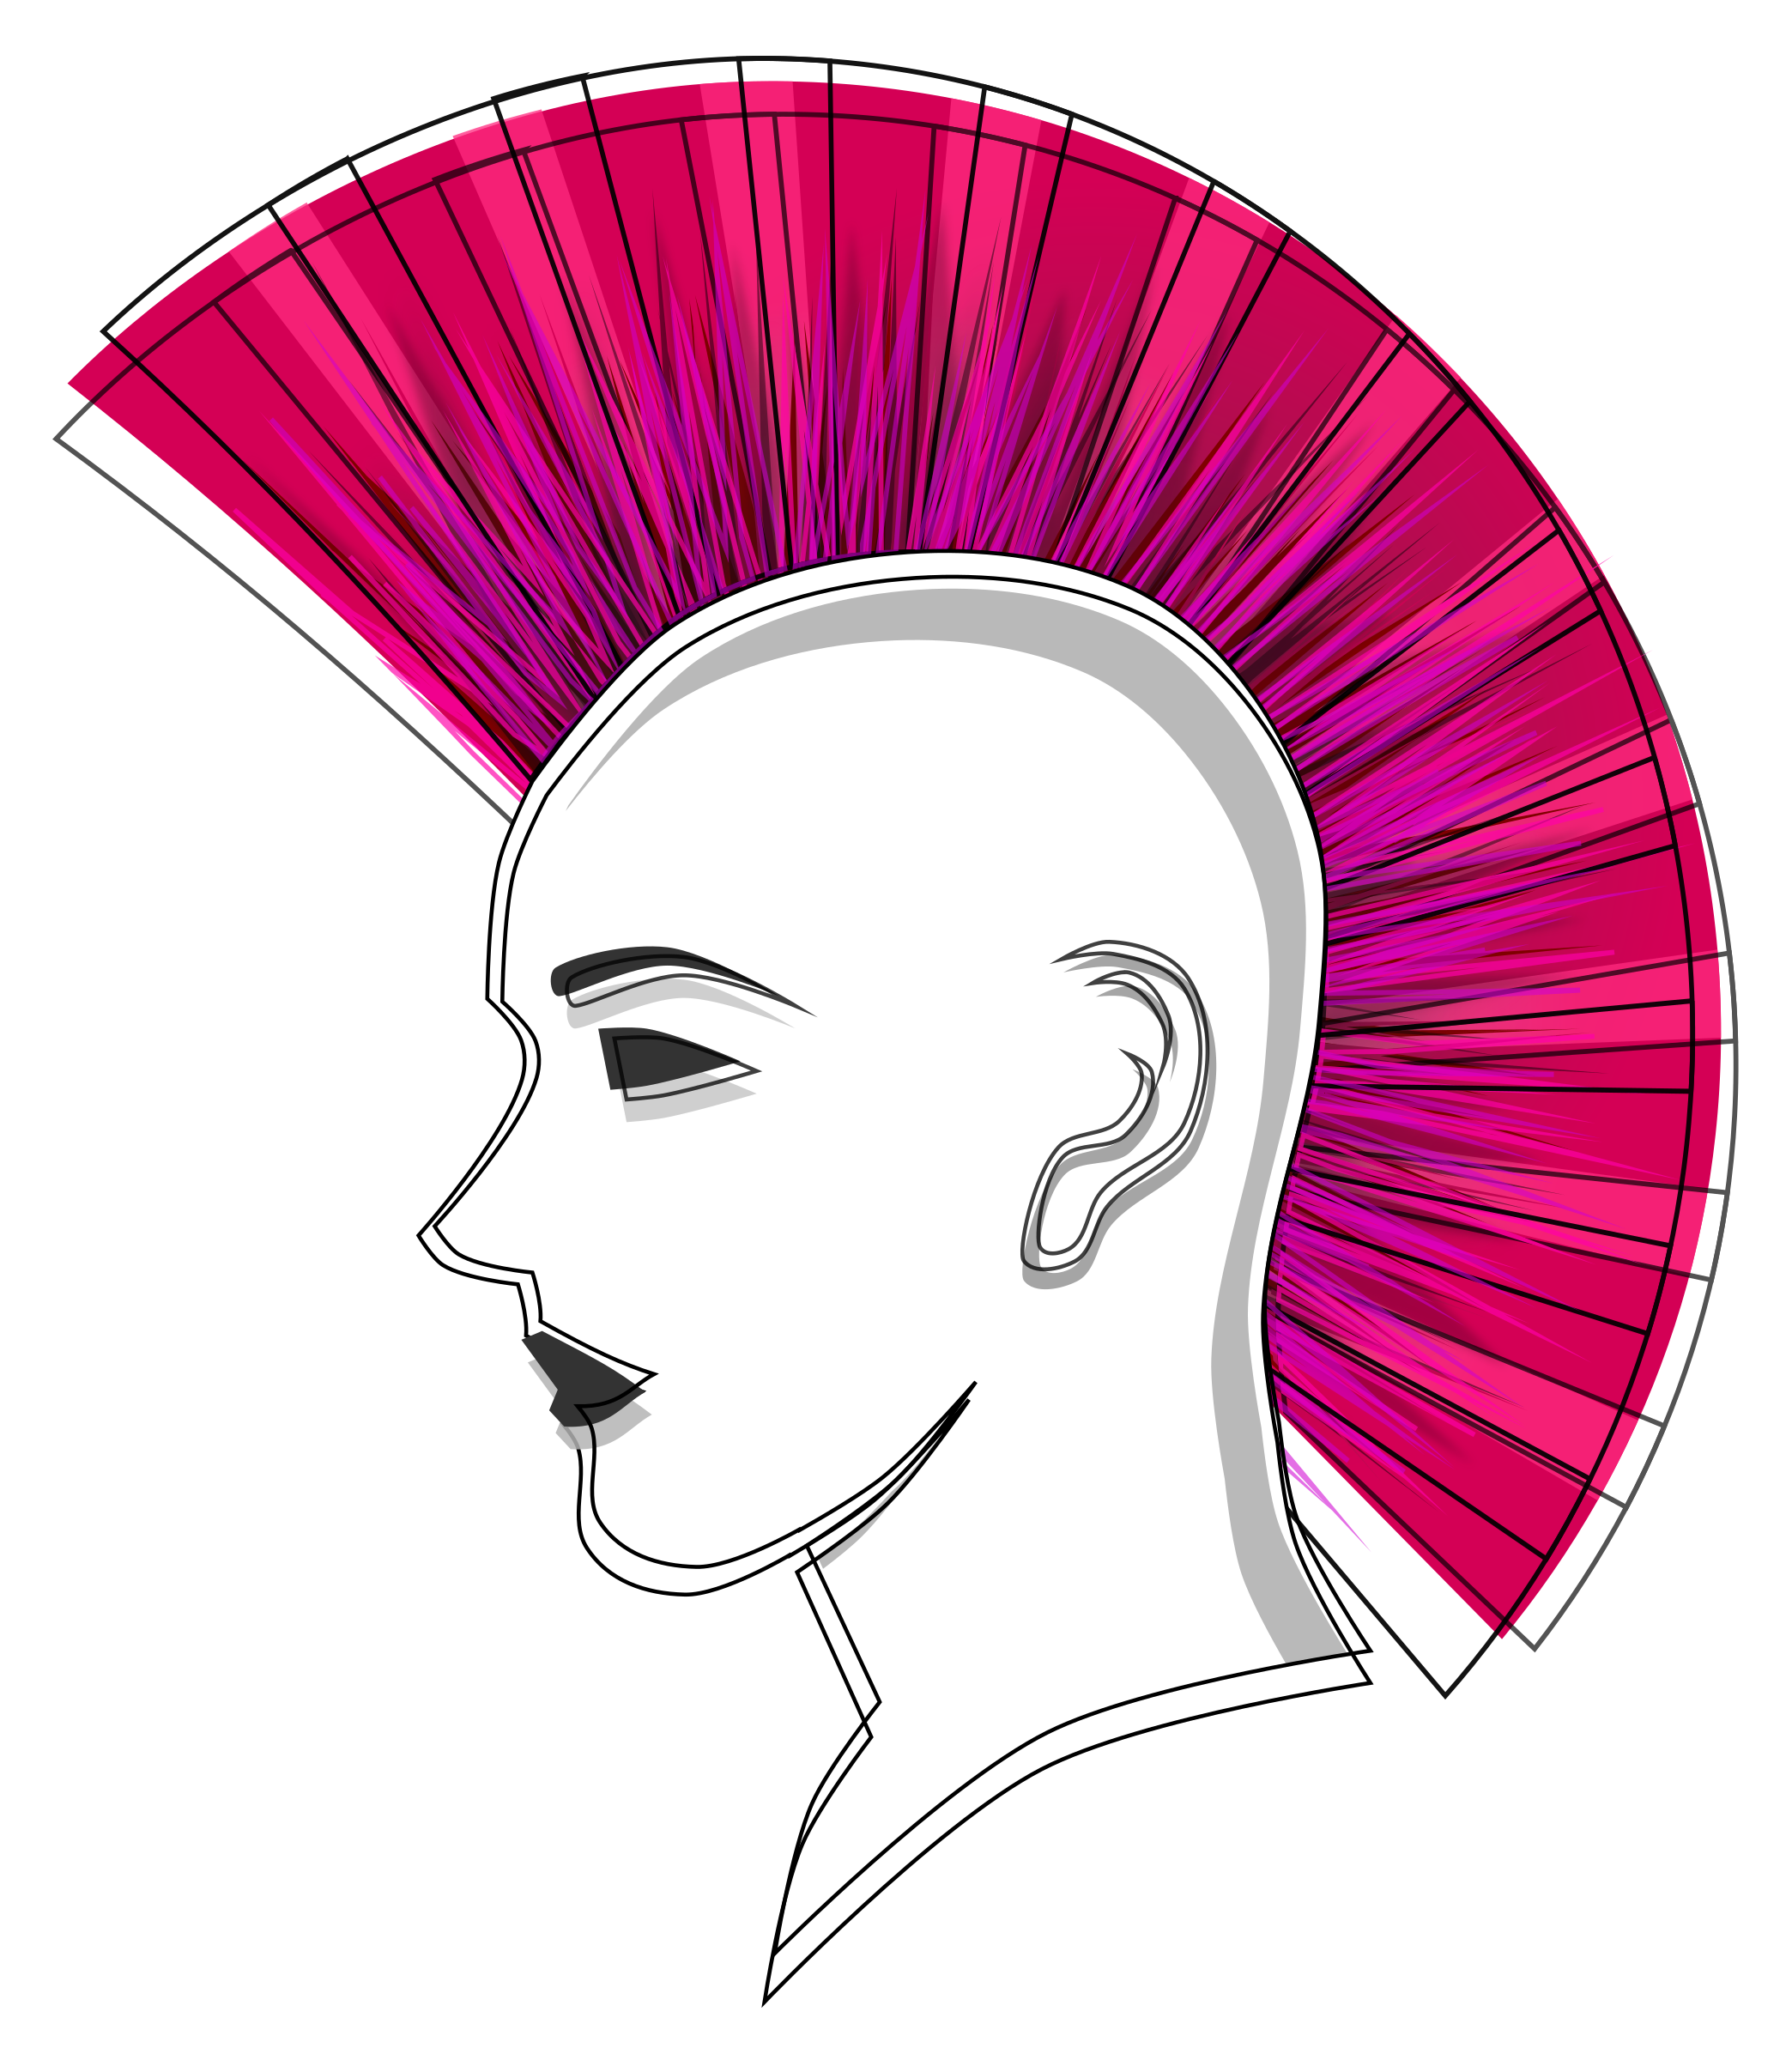 Mohawk Hair Png - Big Image (Png), Transparent background PNG HD thumbnail